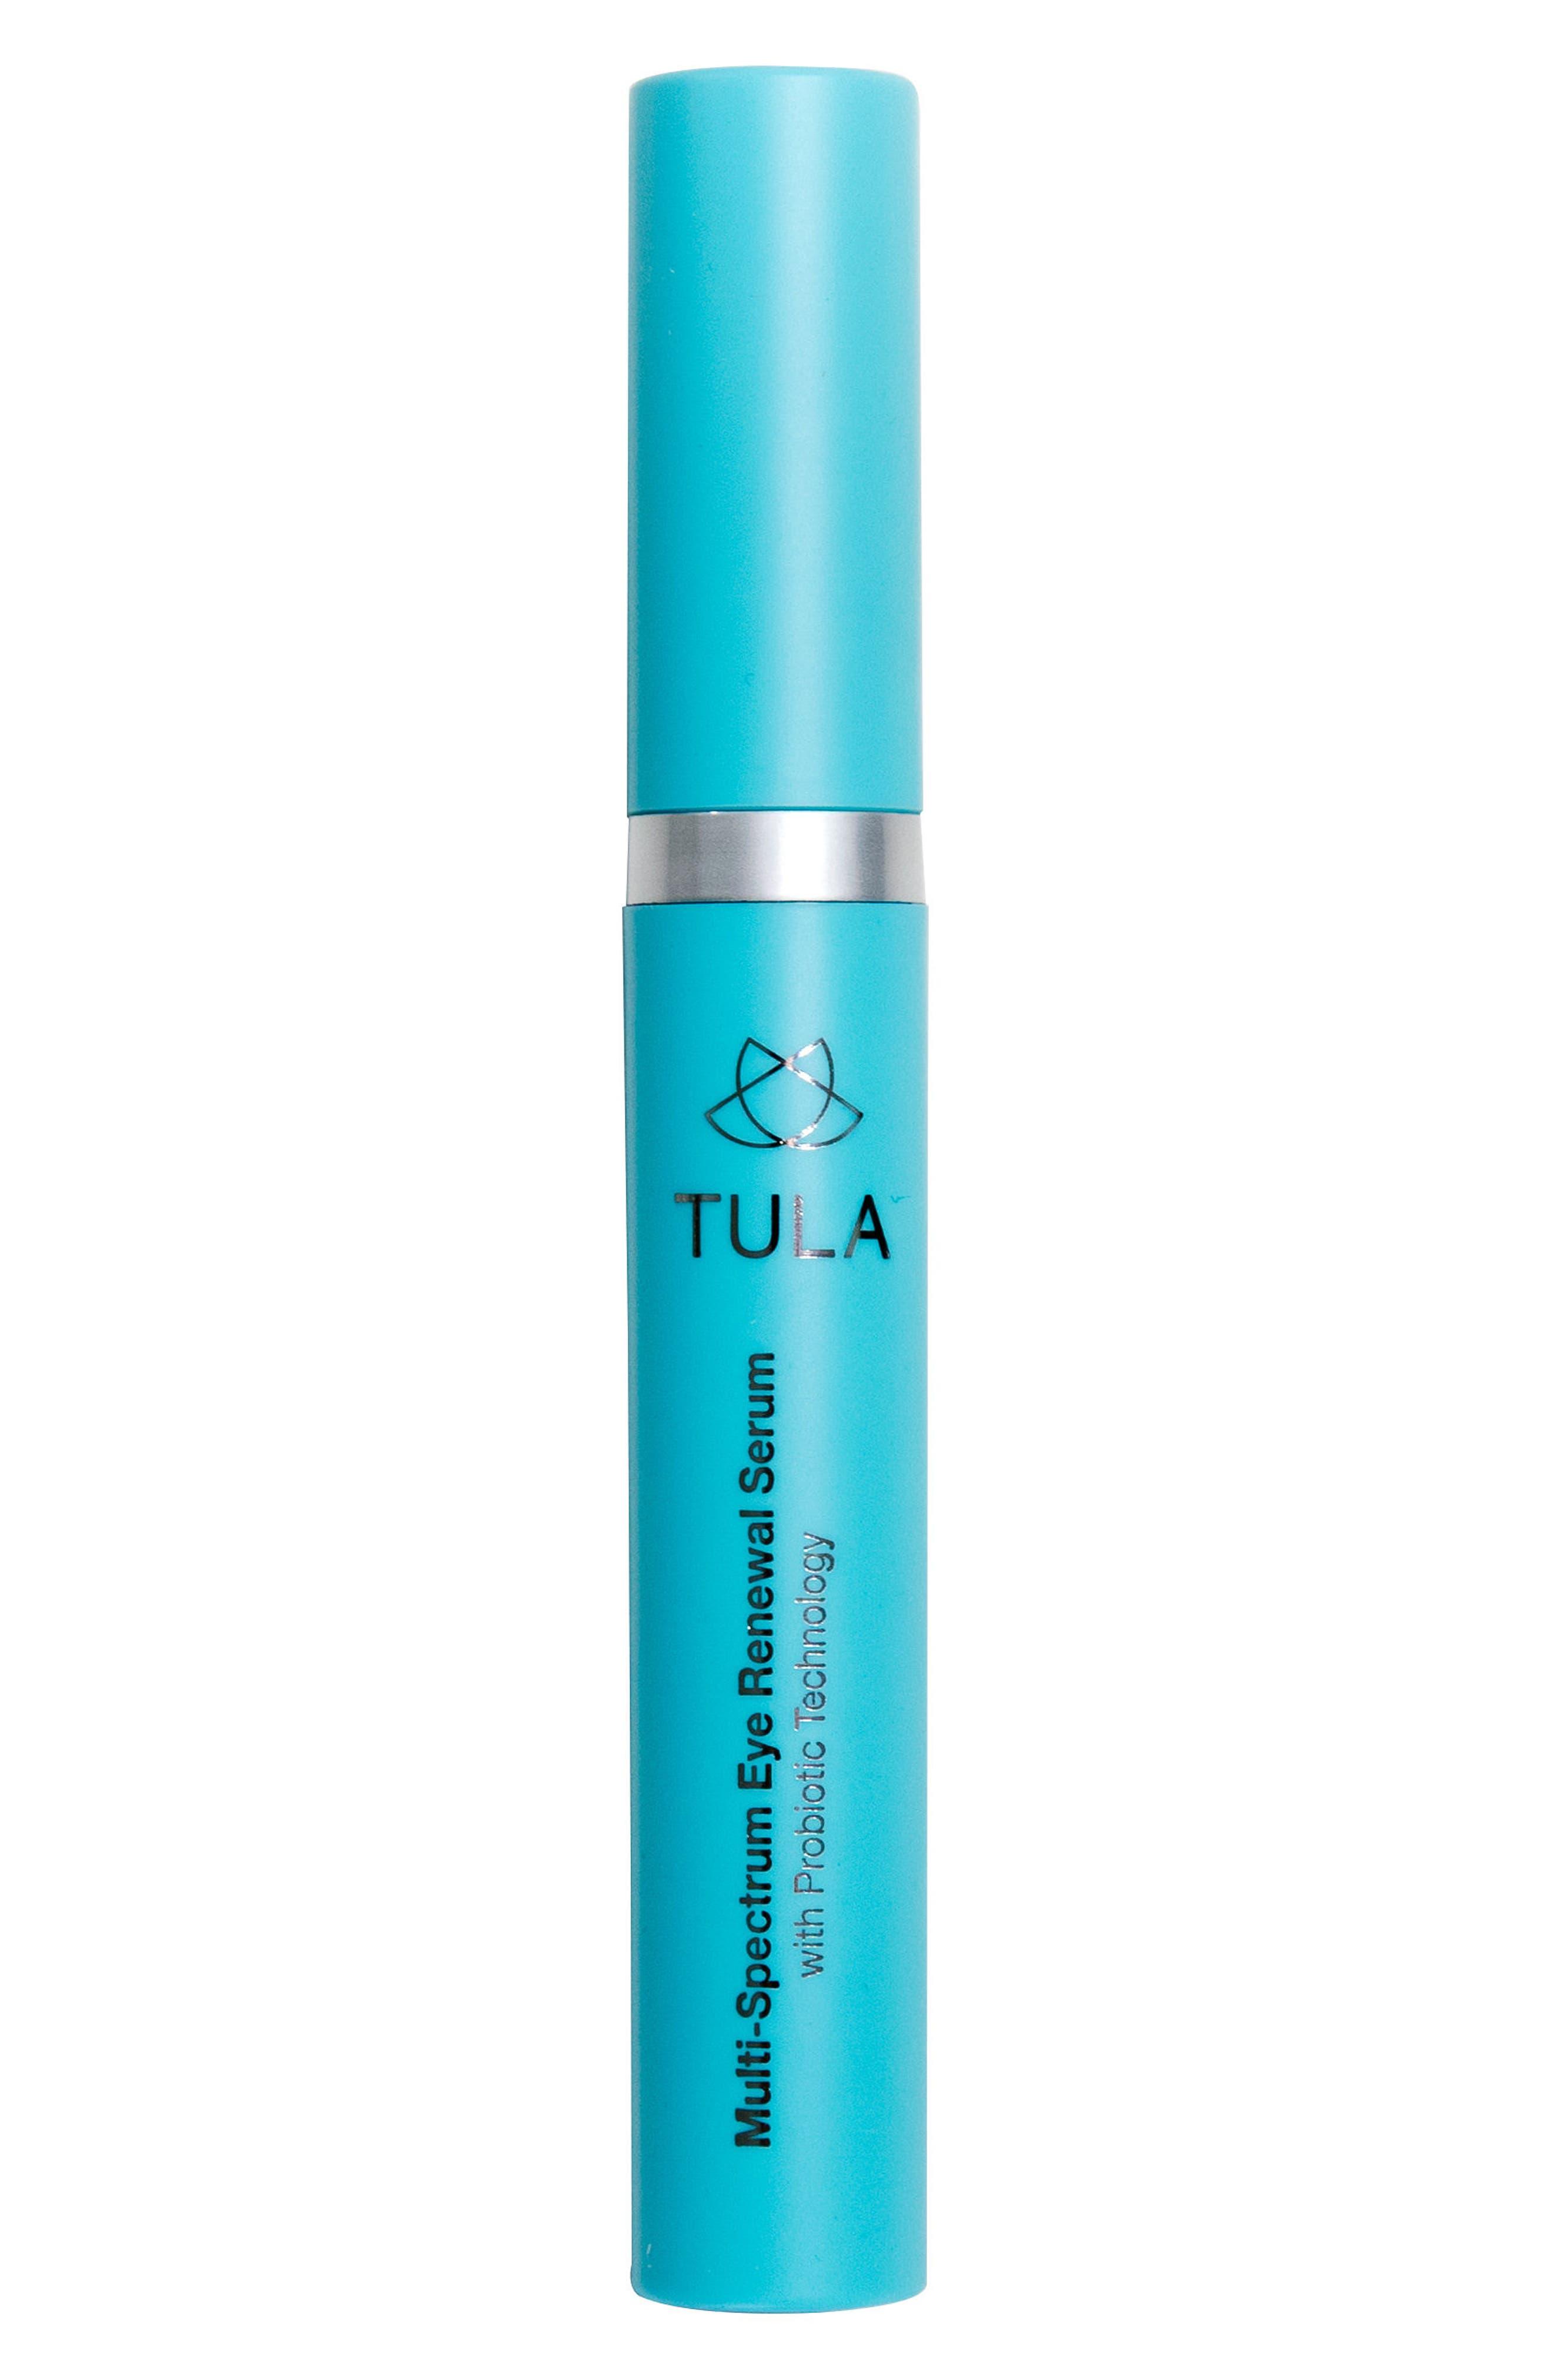 Main Image - Tula Probiotic Skincare Multi-Spectrum Eye Renewal Serum